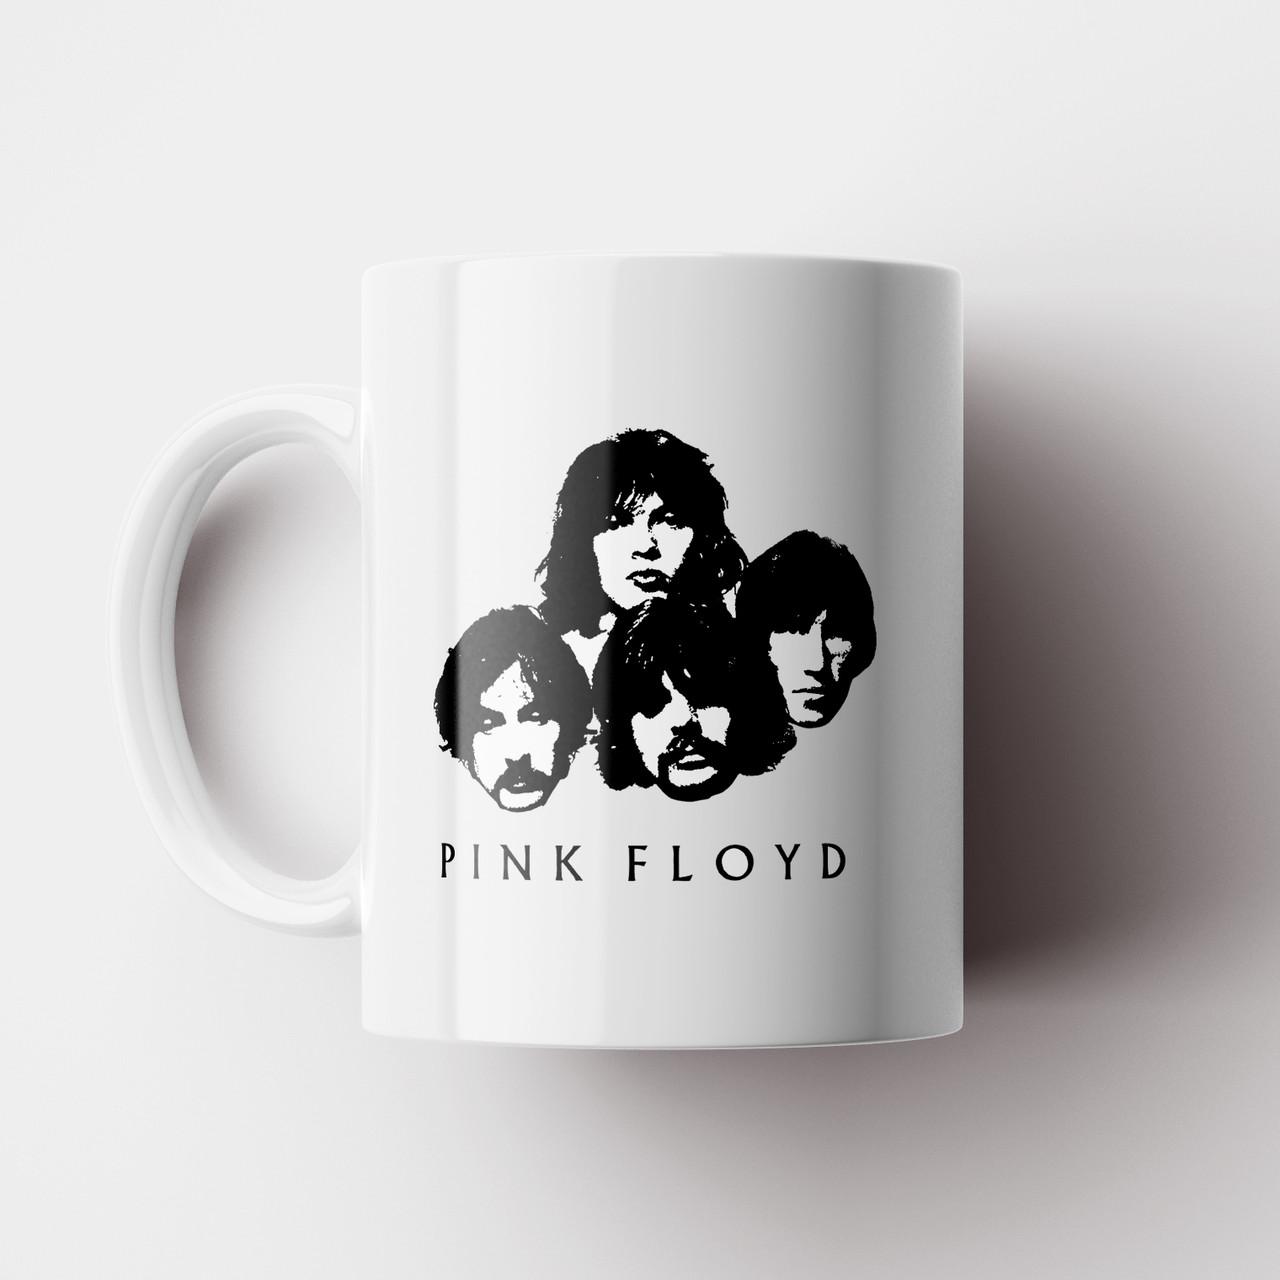 Чашка Pink Floyd. Пинк Флойд. Рок Музыка. Rock